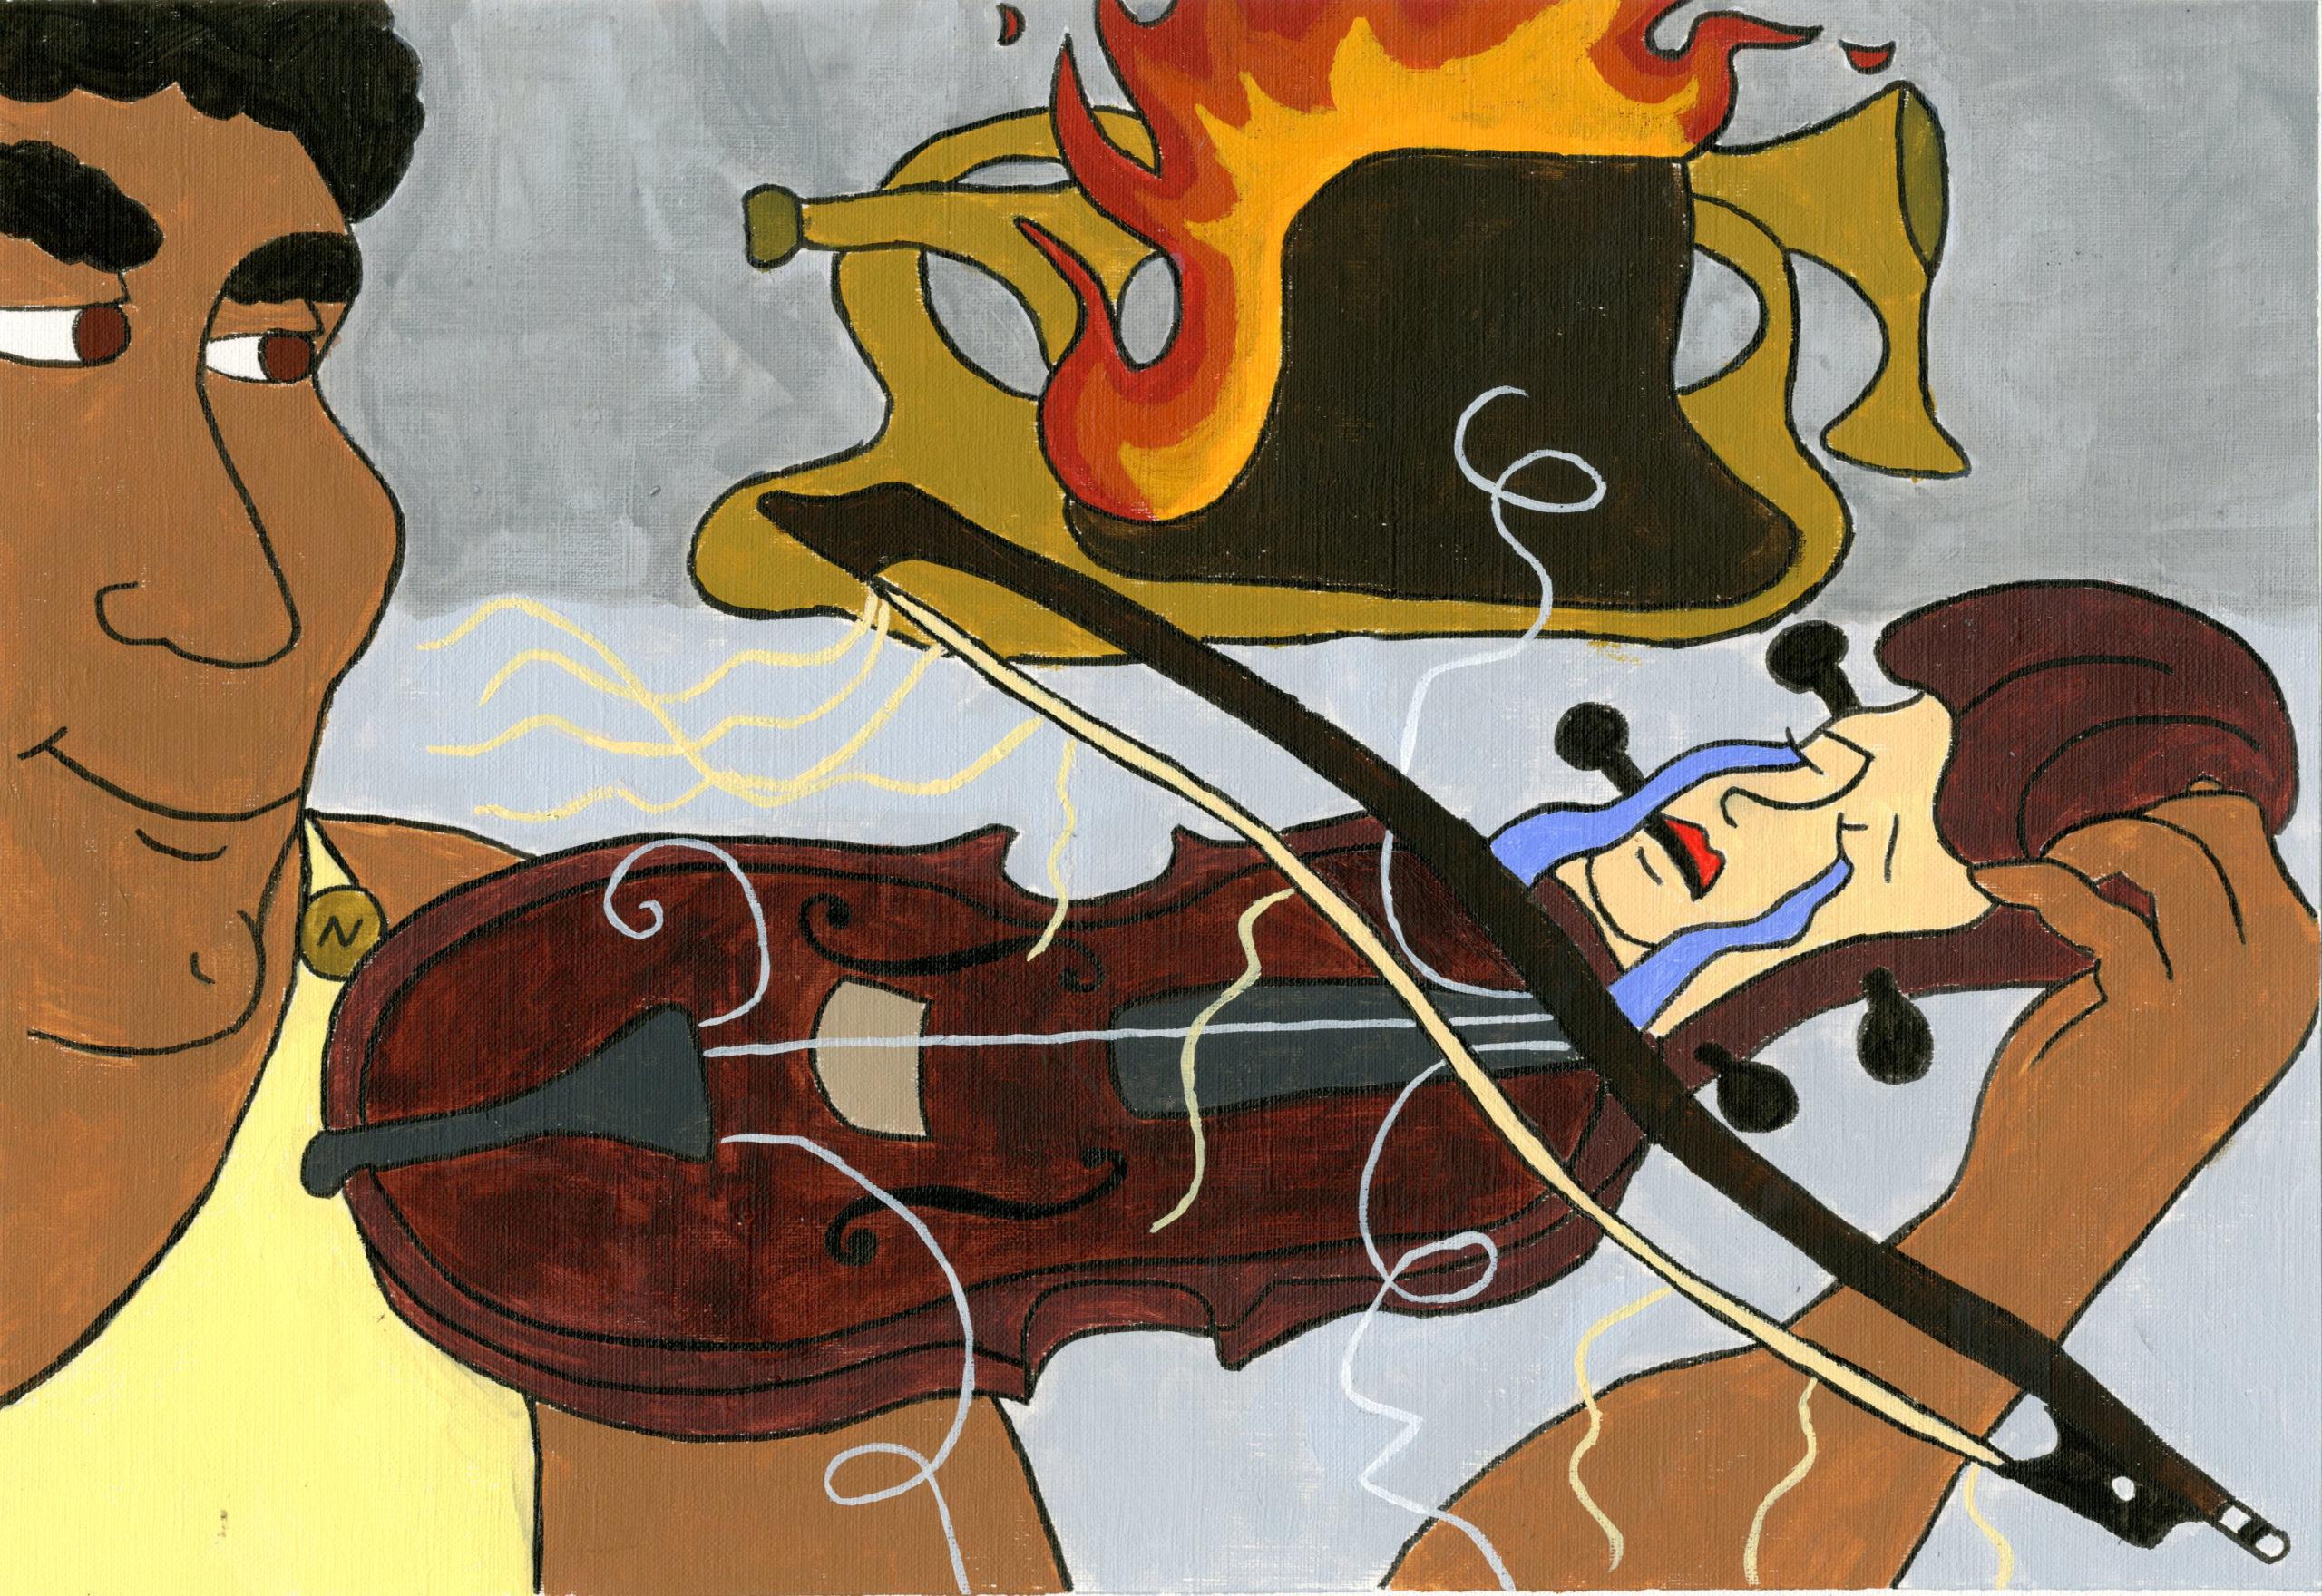 Hercules student artwork from MassArt, Jean